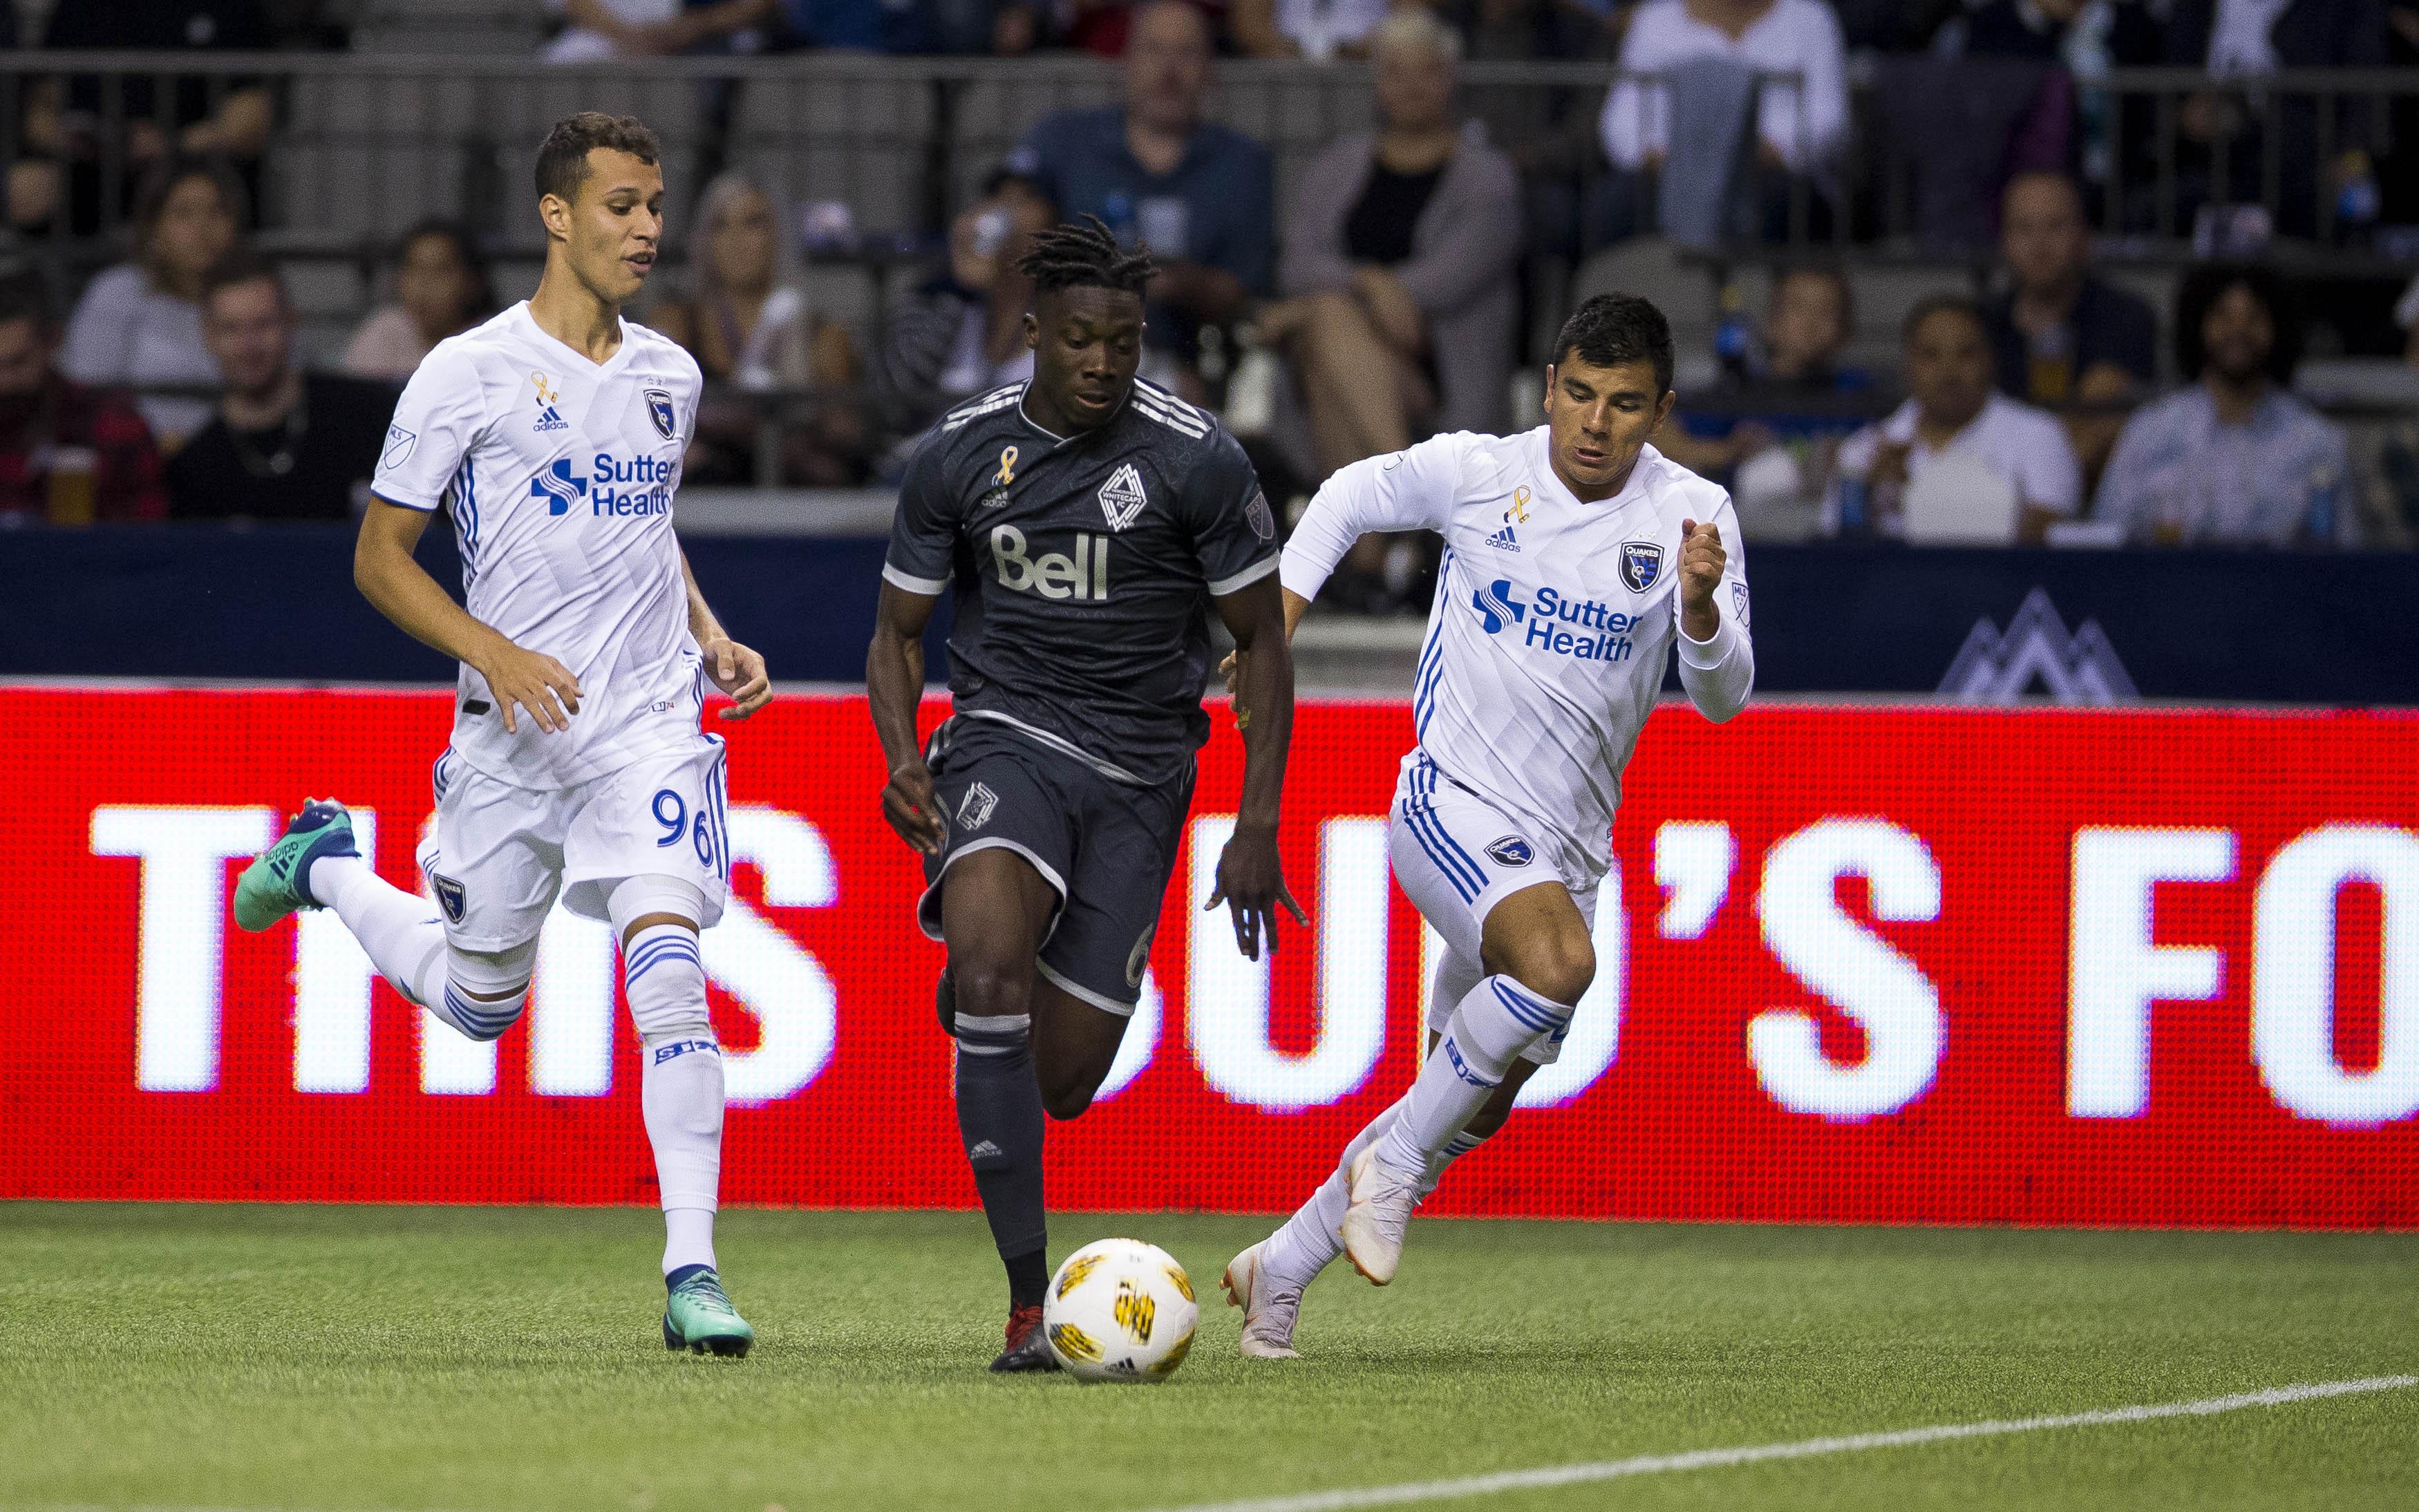 MLS: San Jose Earthquakes defenders chase Vancouver Whitecaps' midfielder Alphonso Davies on the ball